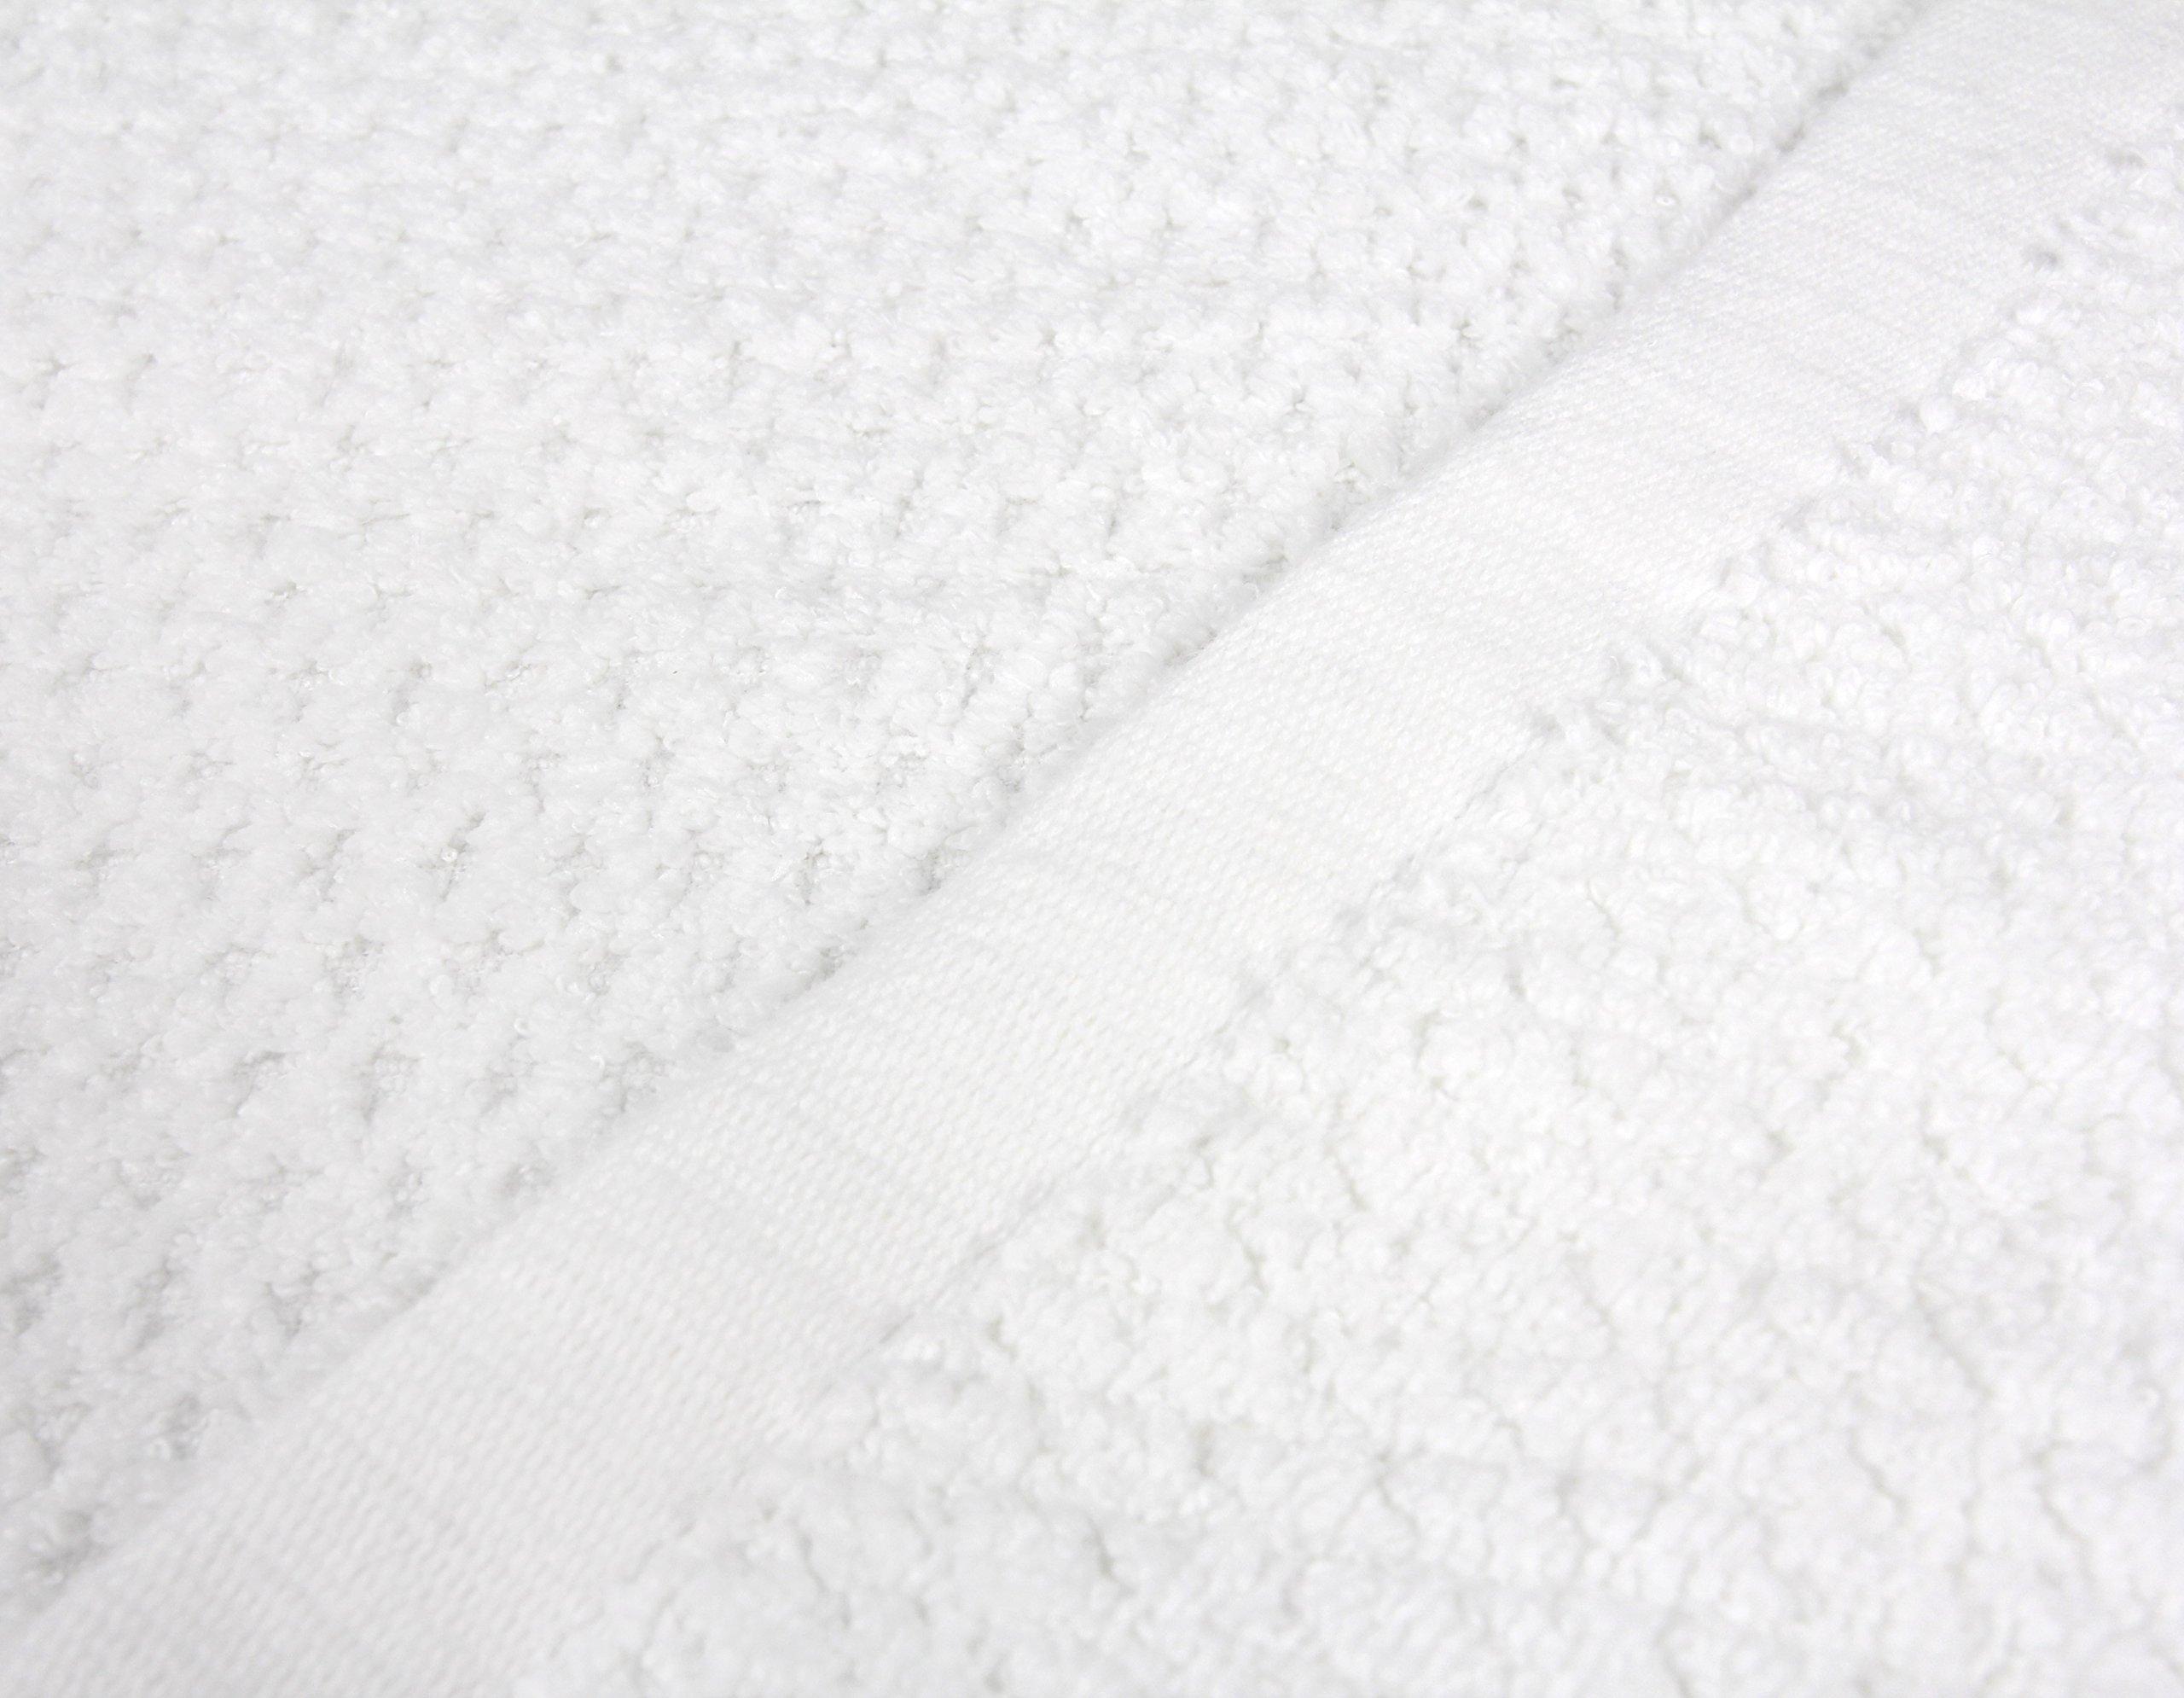 Everplush Diamond Jacquard Bath Sheet 2 Pack in White by Everplush (Image #2)